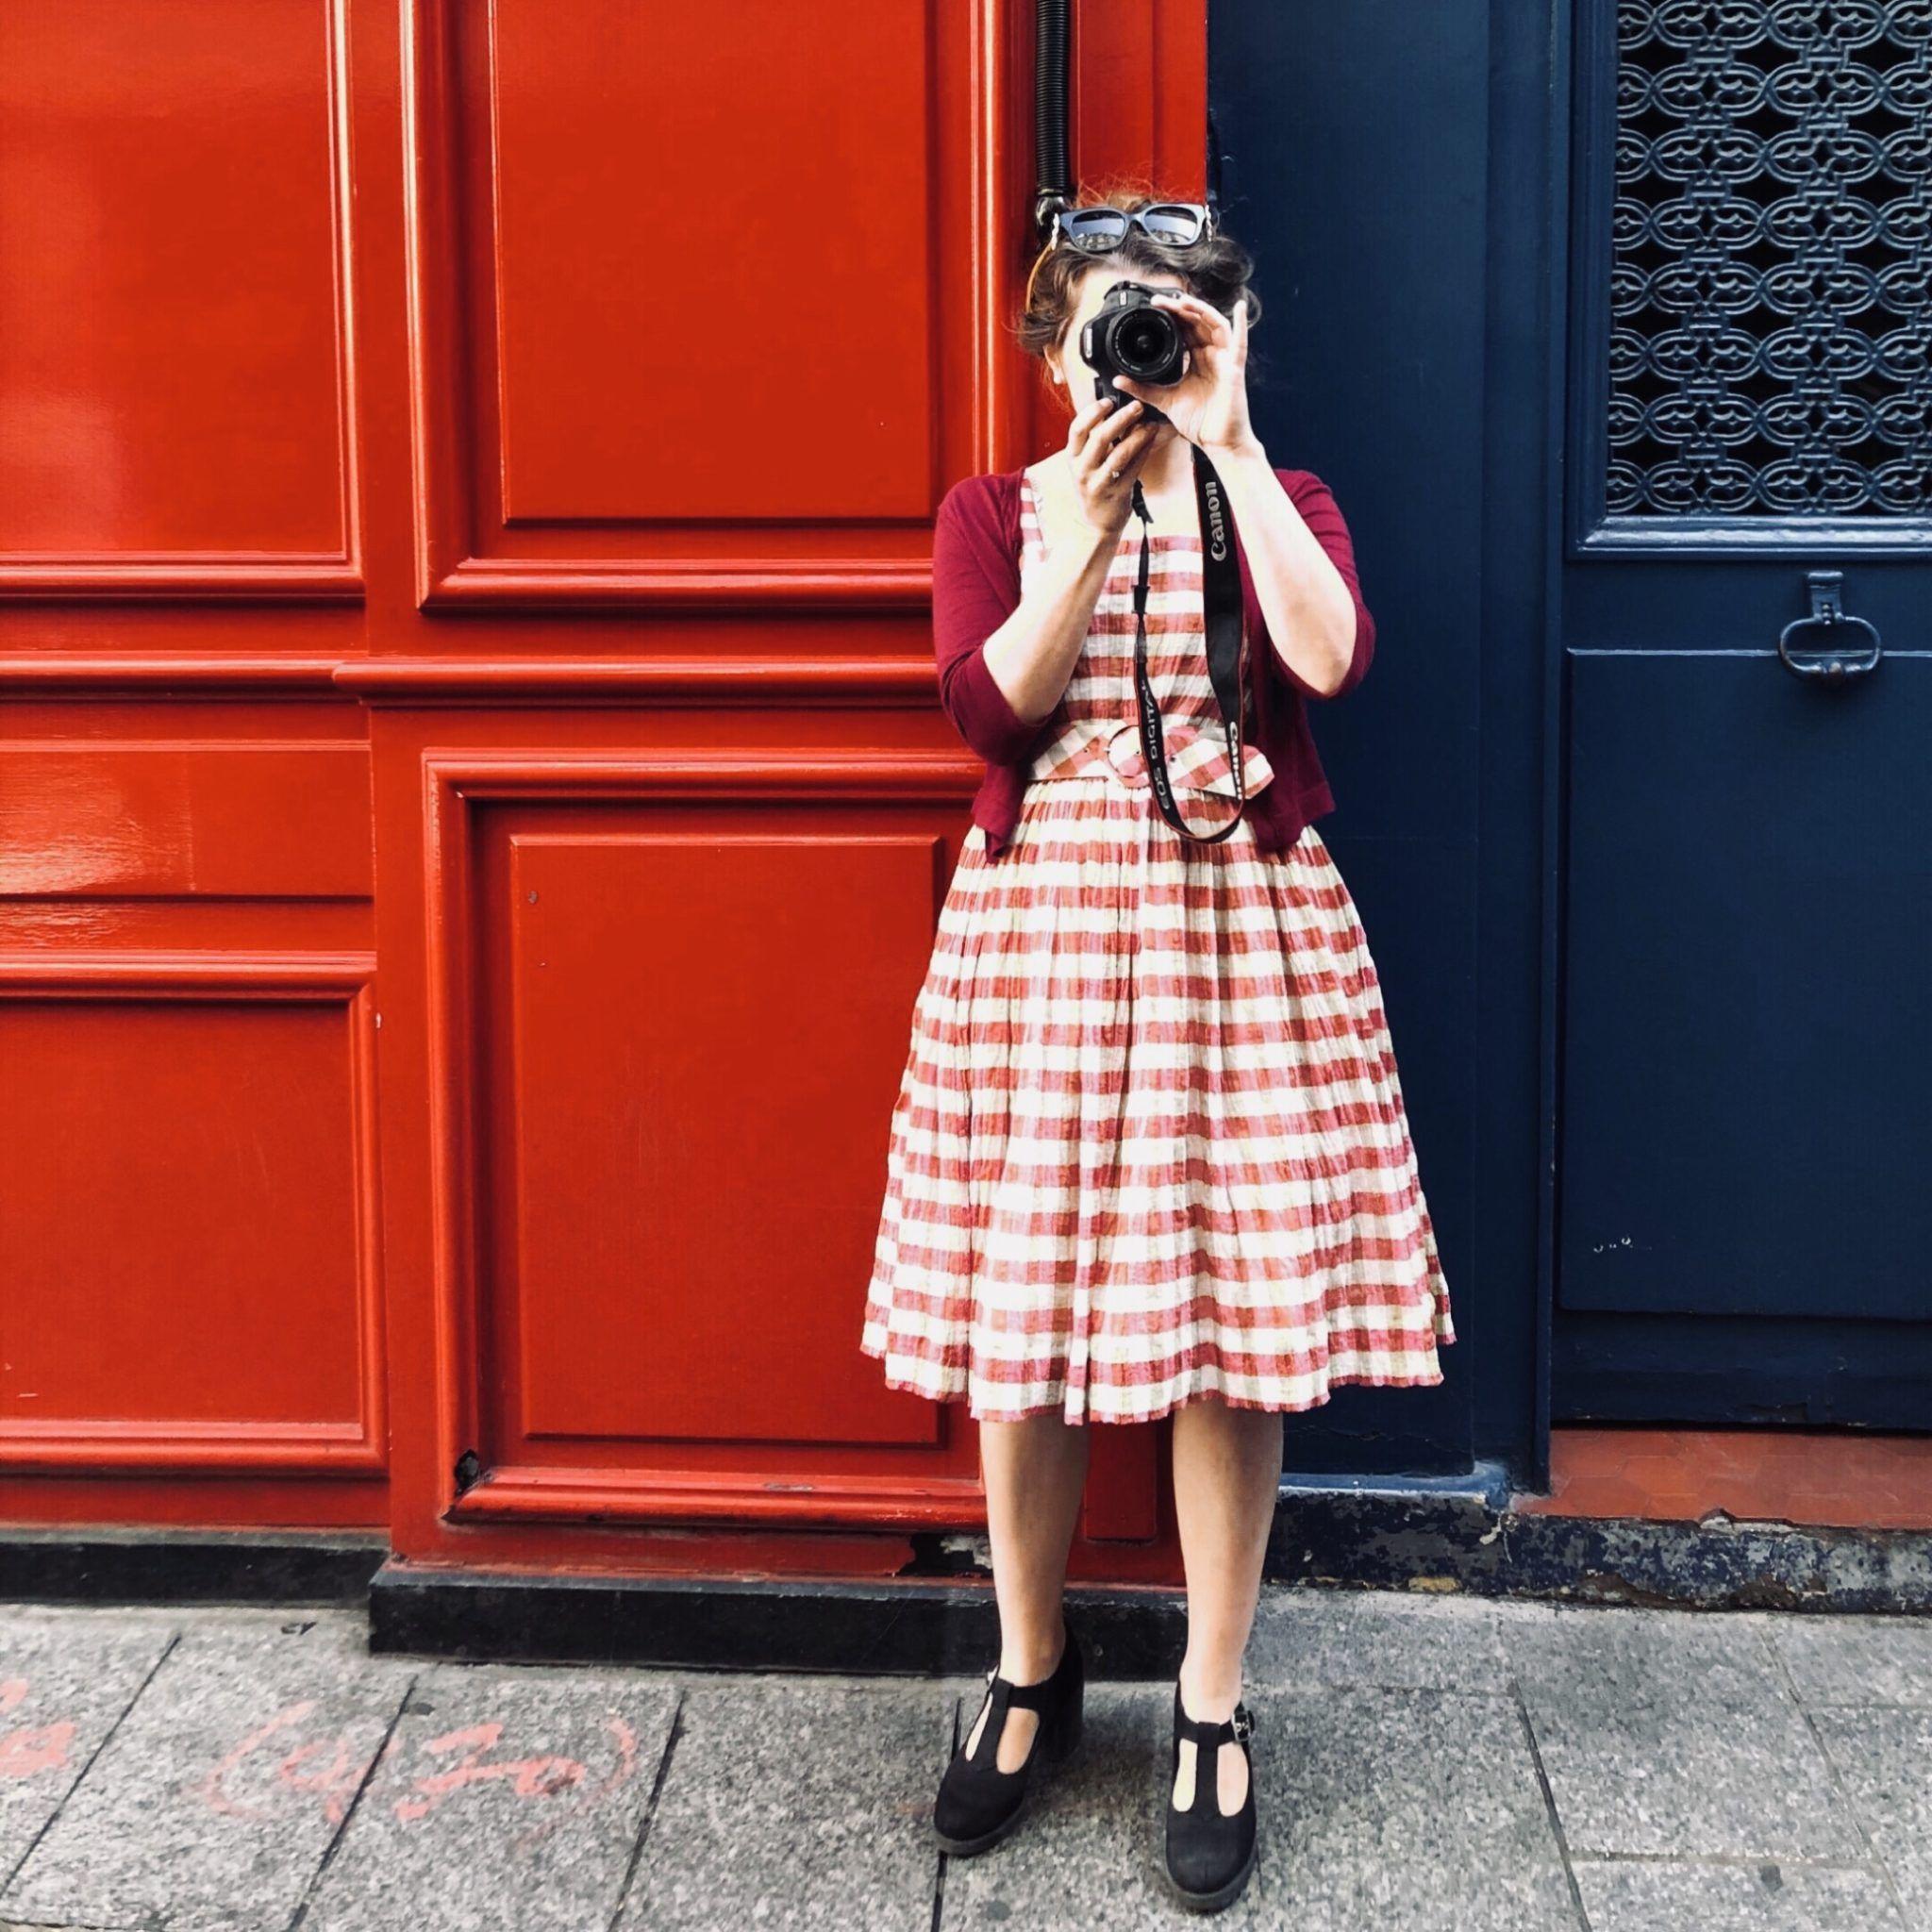 Der er intet som en fin September20 kjole og en perfekt baggrund.